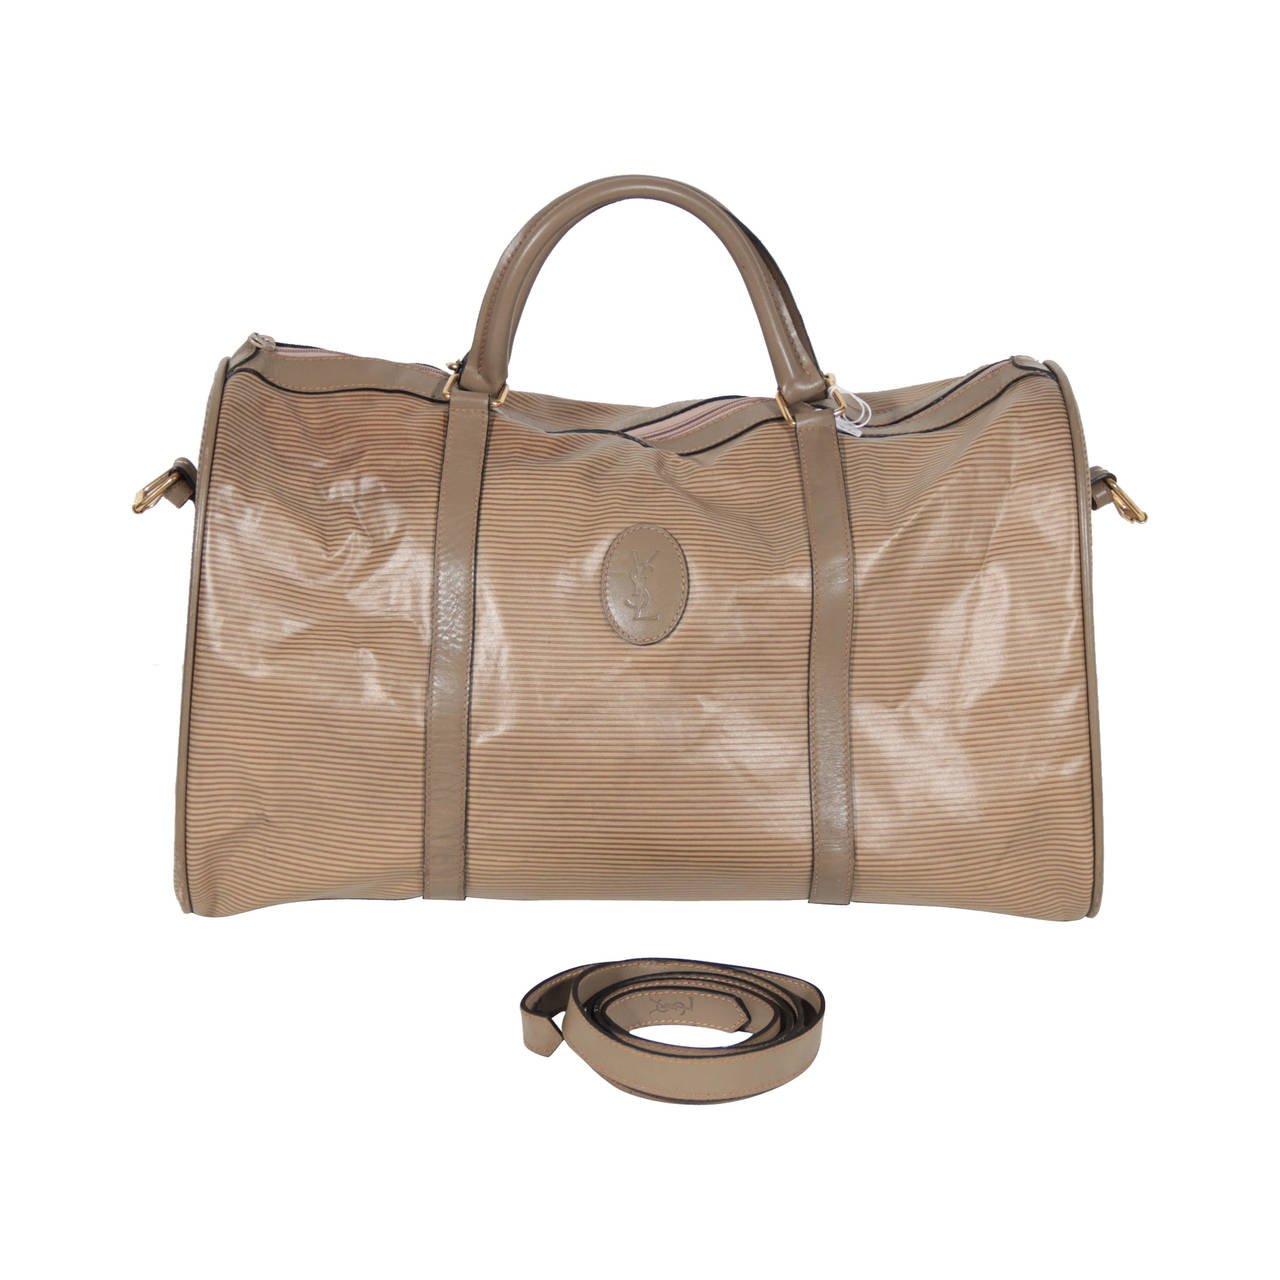 Yves Saint Laurent Handbags | Saint Laurent Mens Wallet | Saint Laurent Womens Sneakers